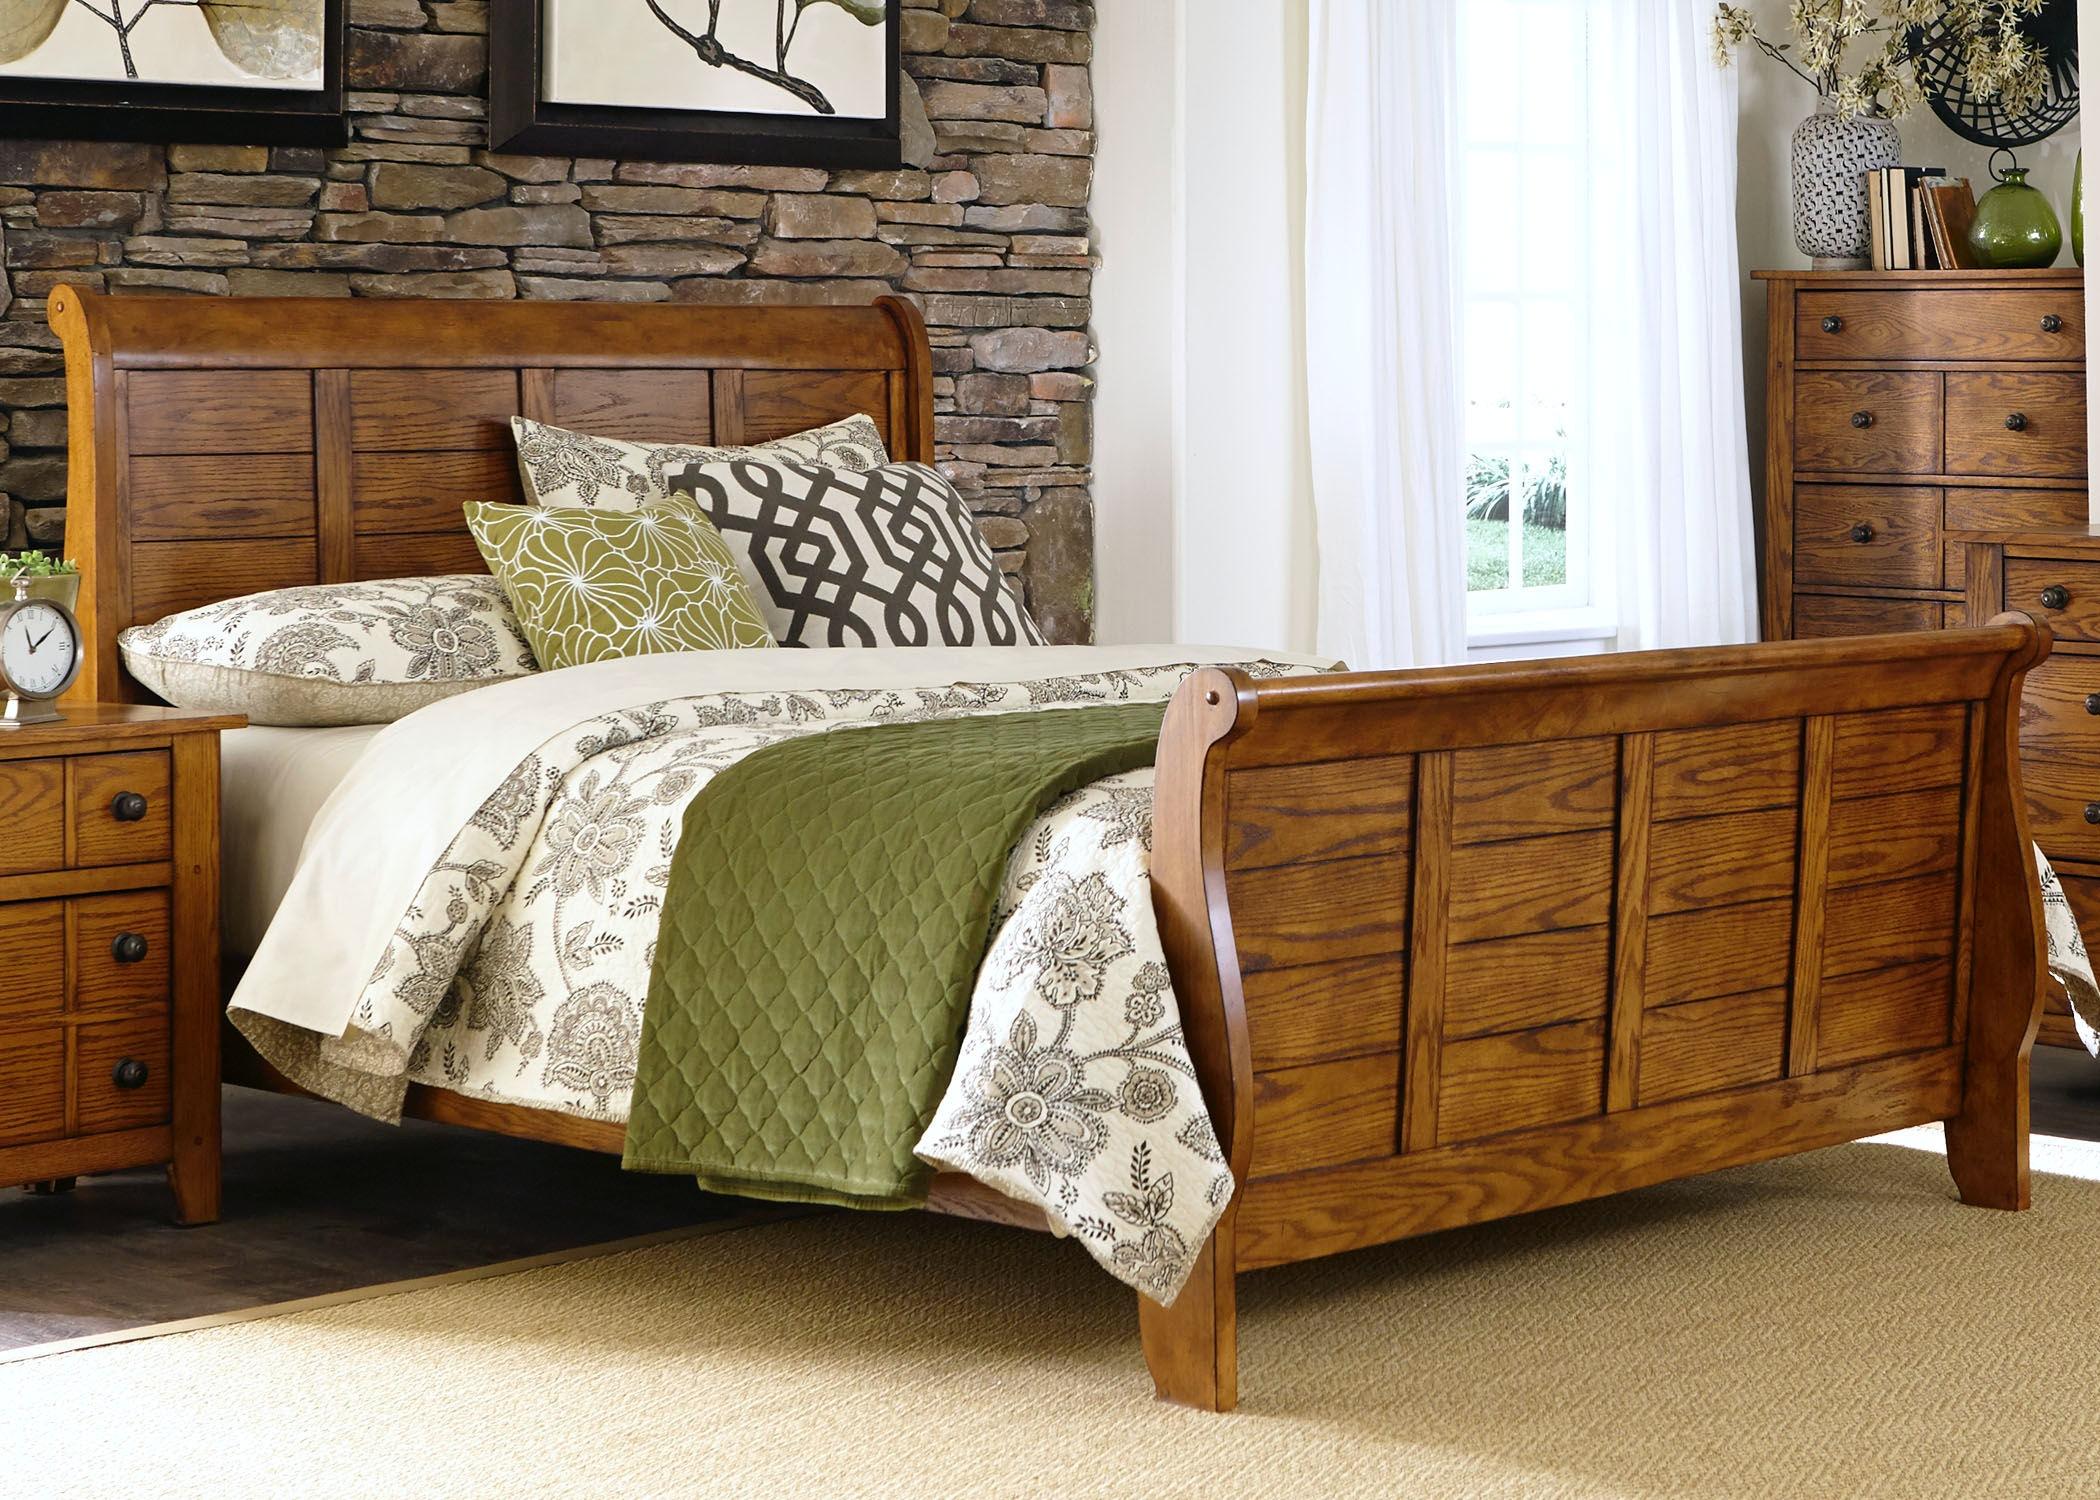 Marvelous Liberty Furniture Bedroom Queen Sleigh Rails 175 BR21R At Waltman Furniture